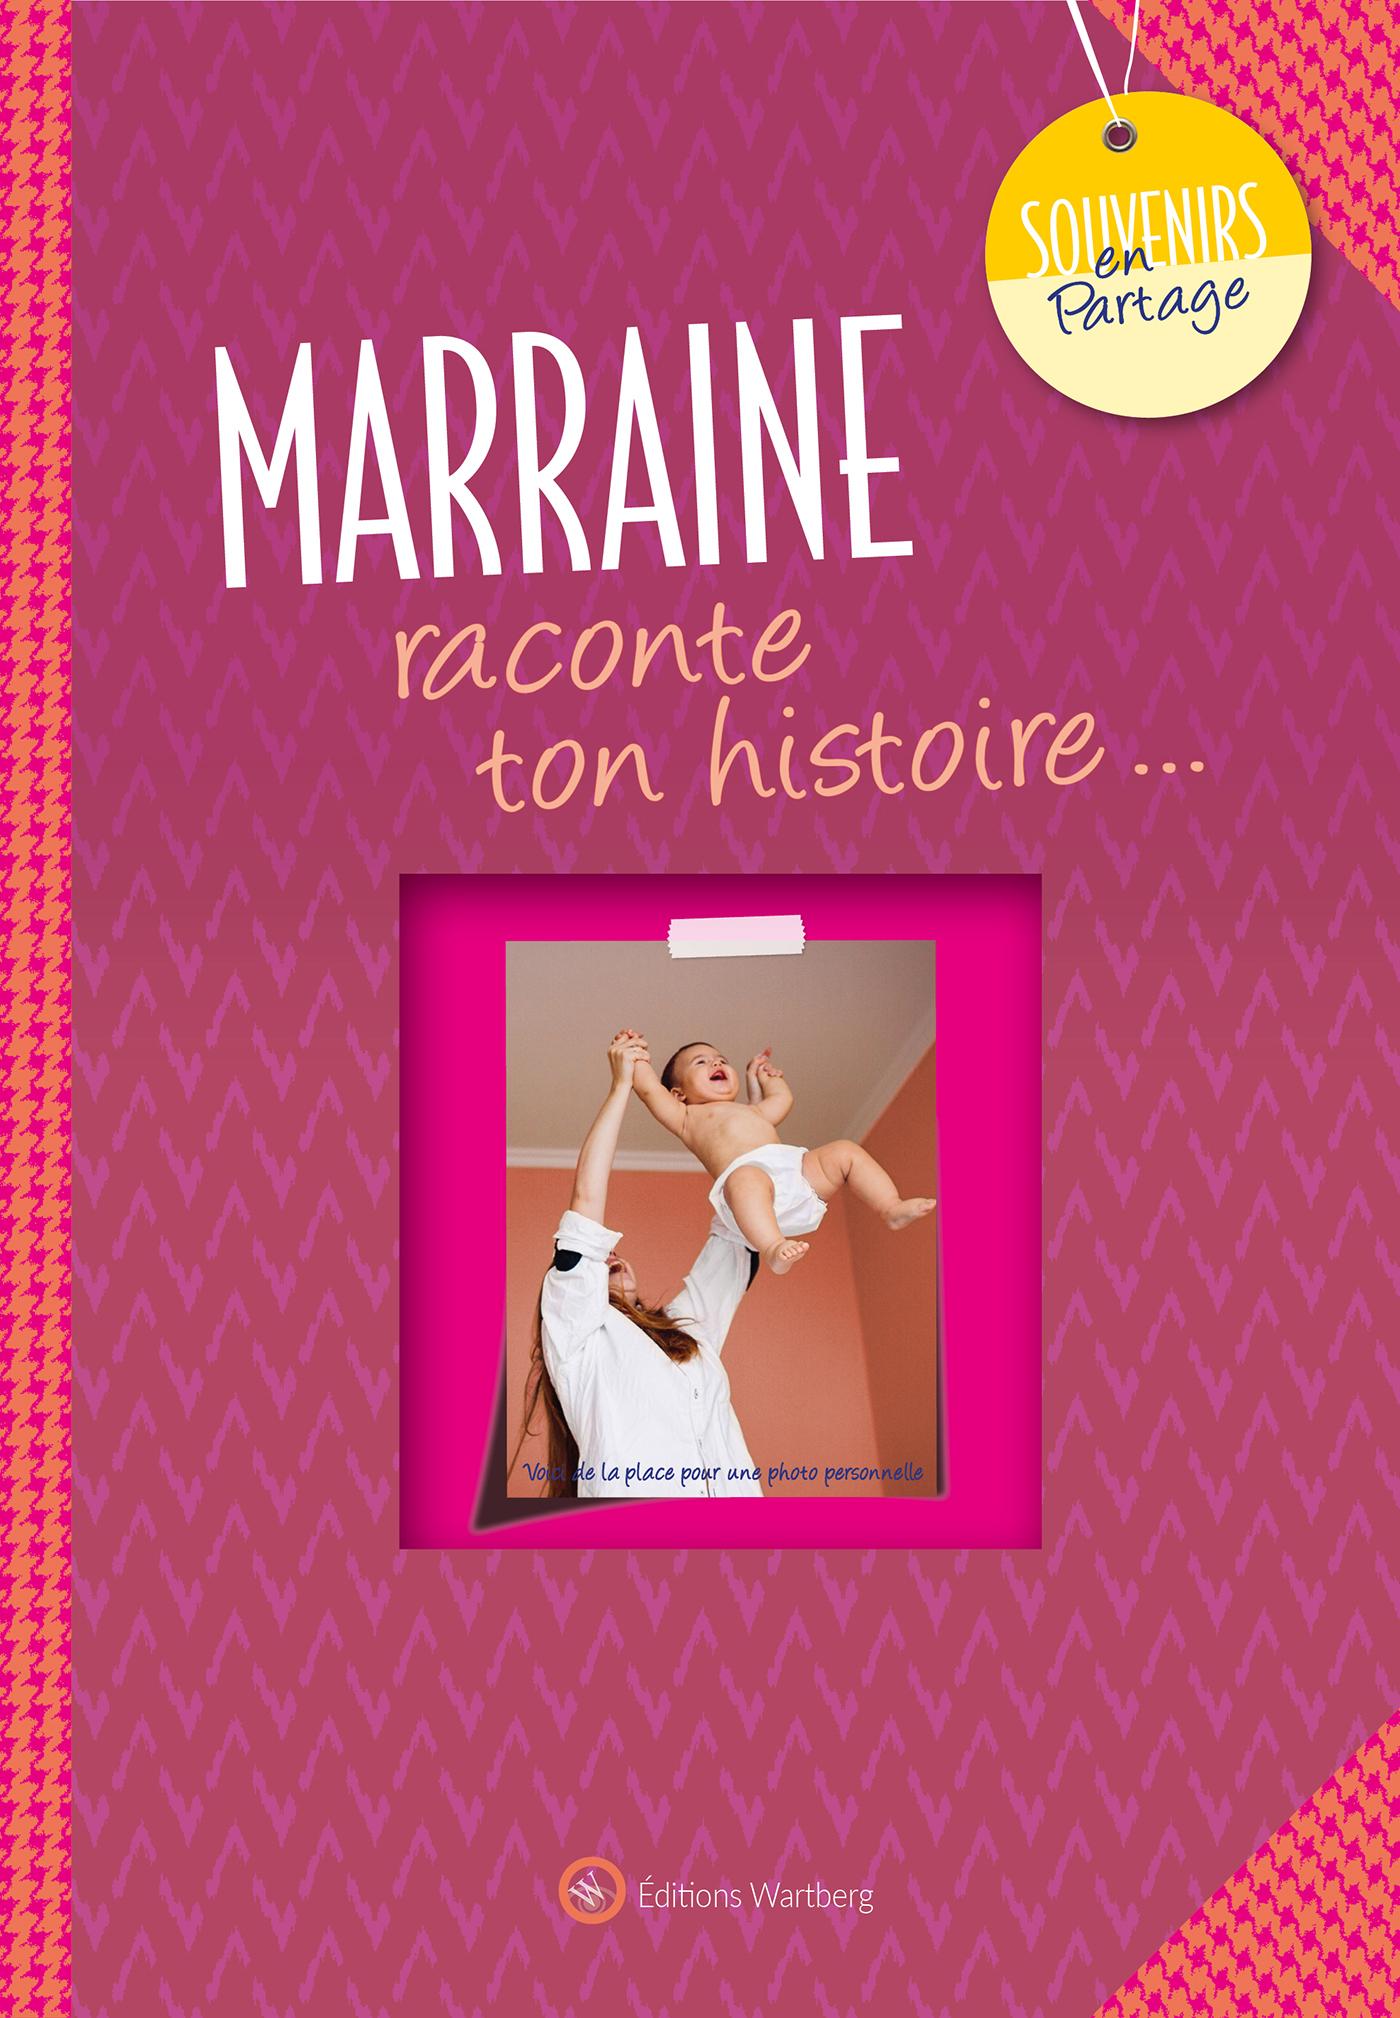 MARRAINE, RACONTE TON HISTOIRE...